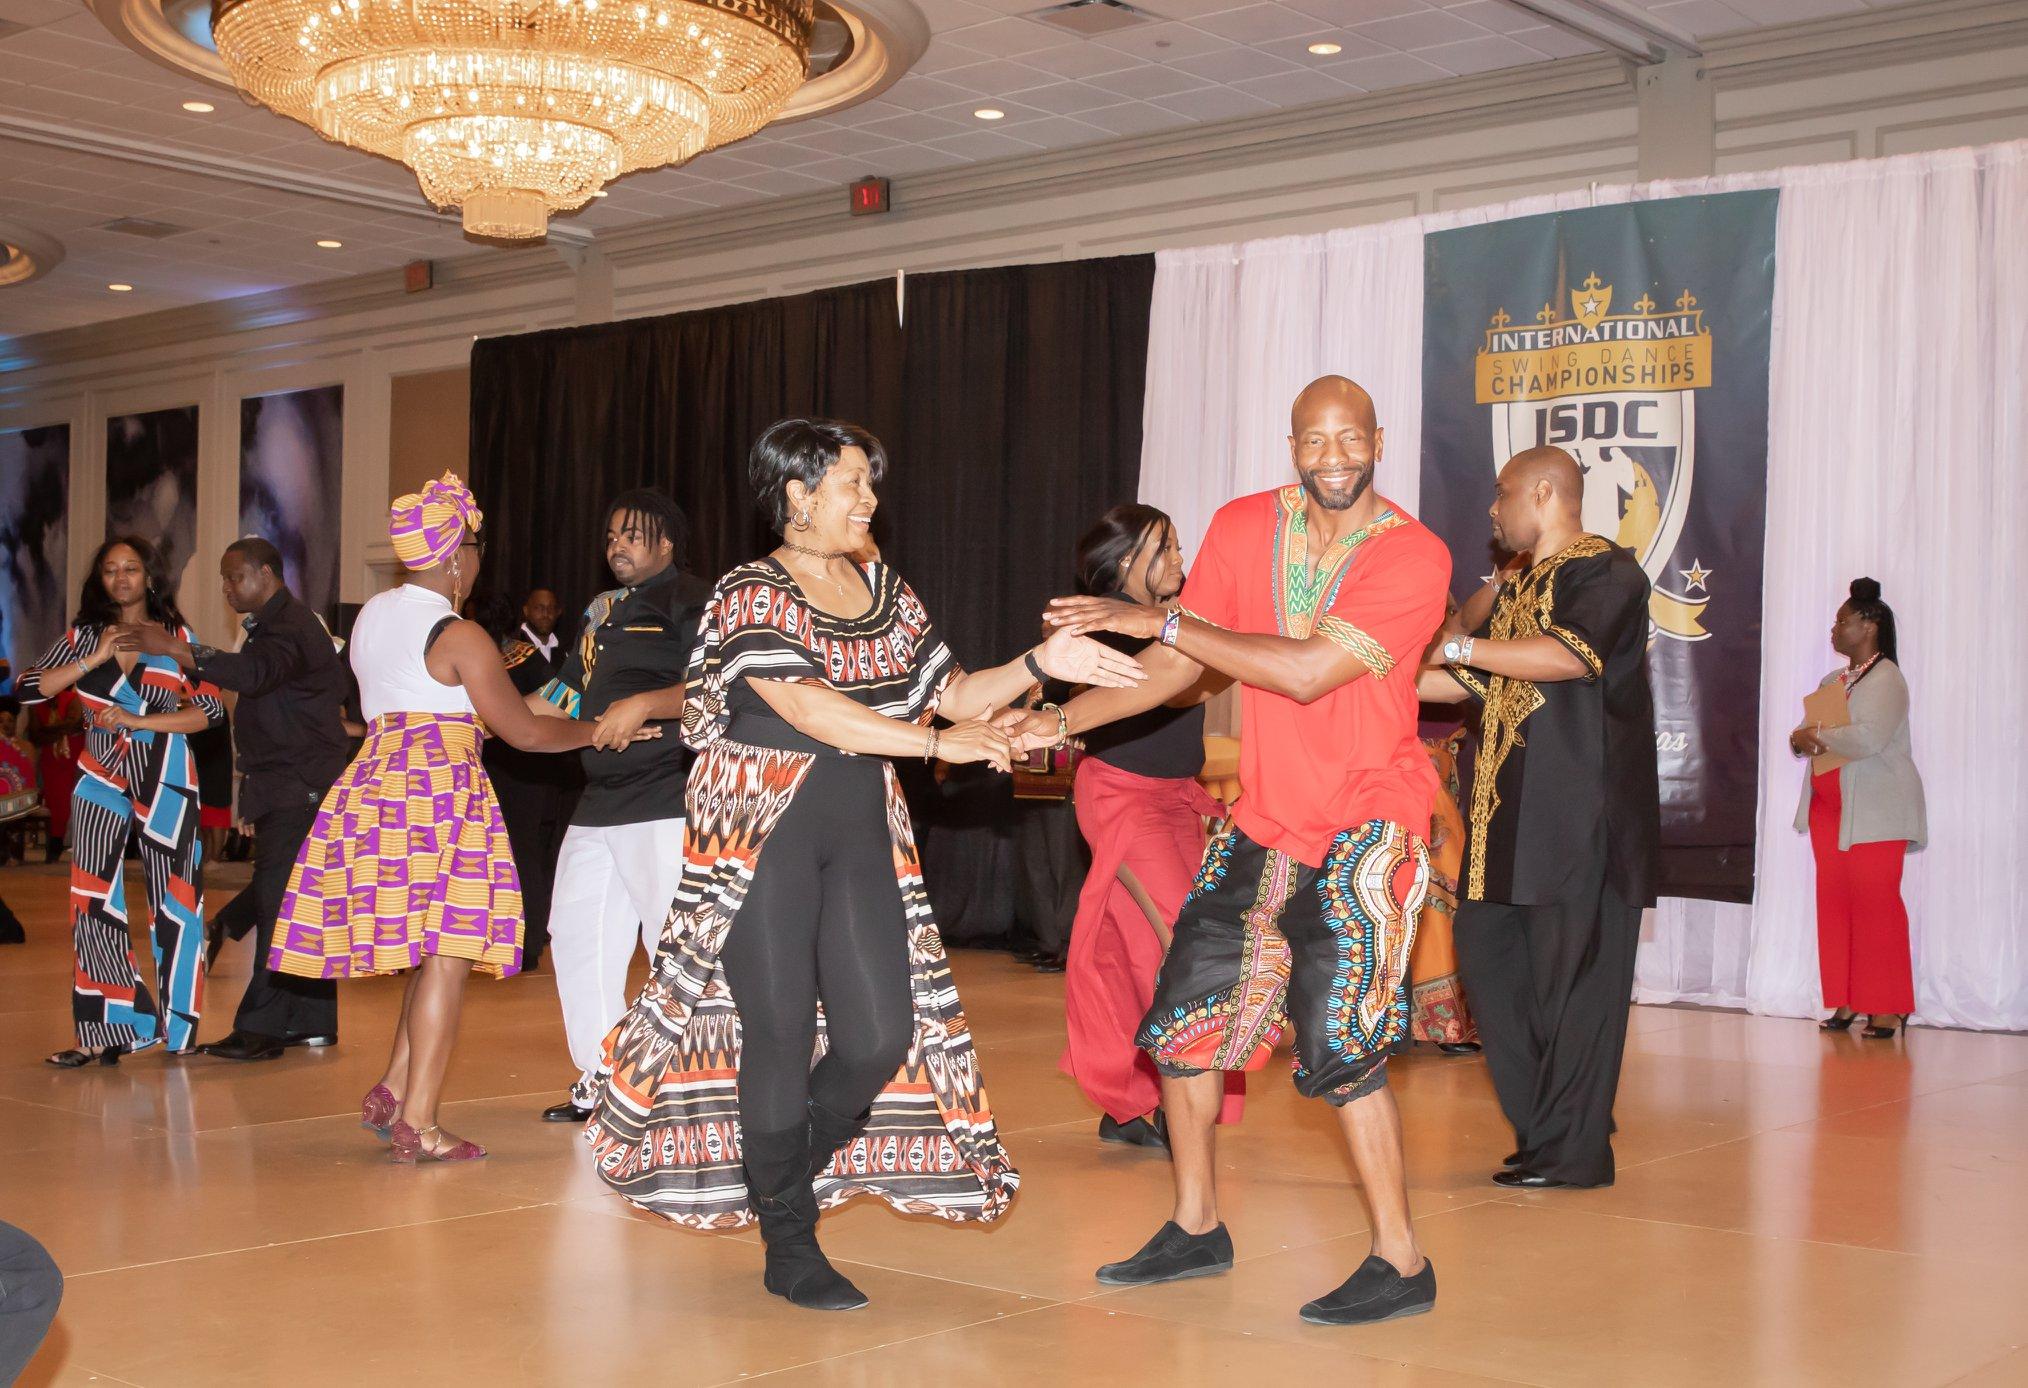 International Swing Dance Championships